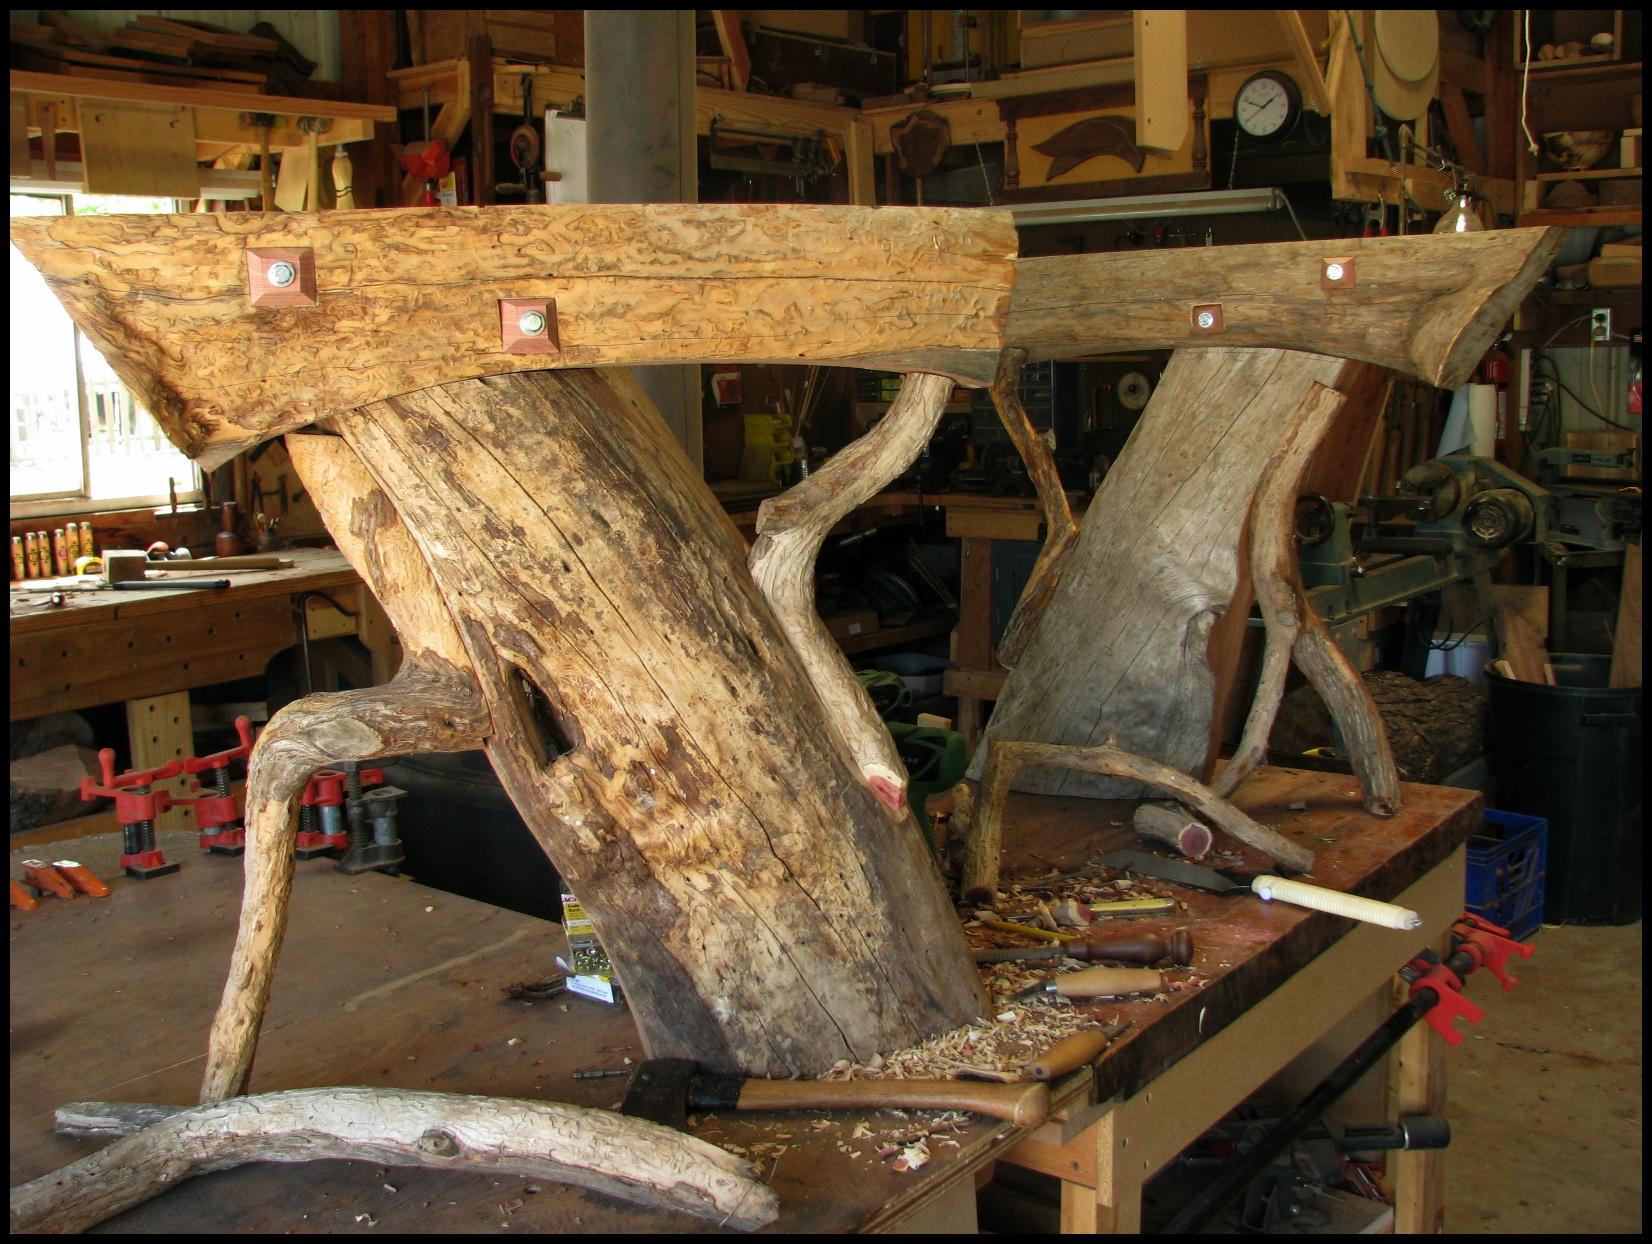 press back chair desk gumtree rustic furniture   the school of transfer energy